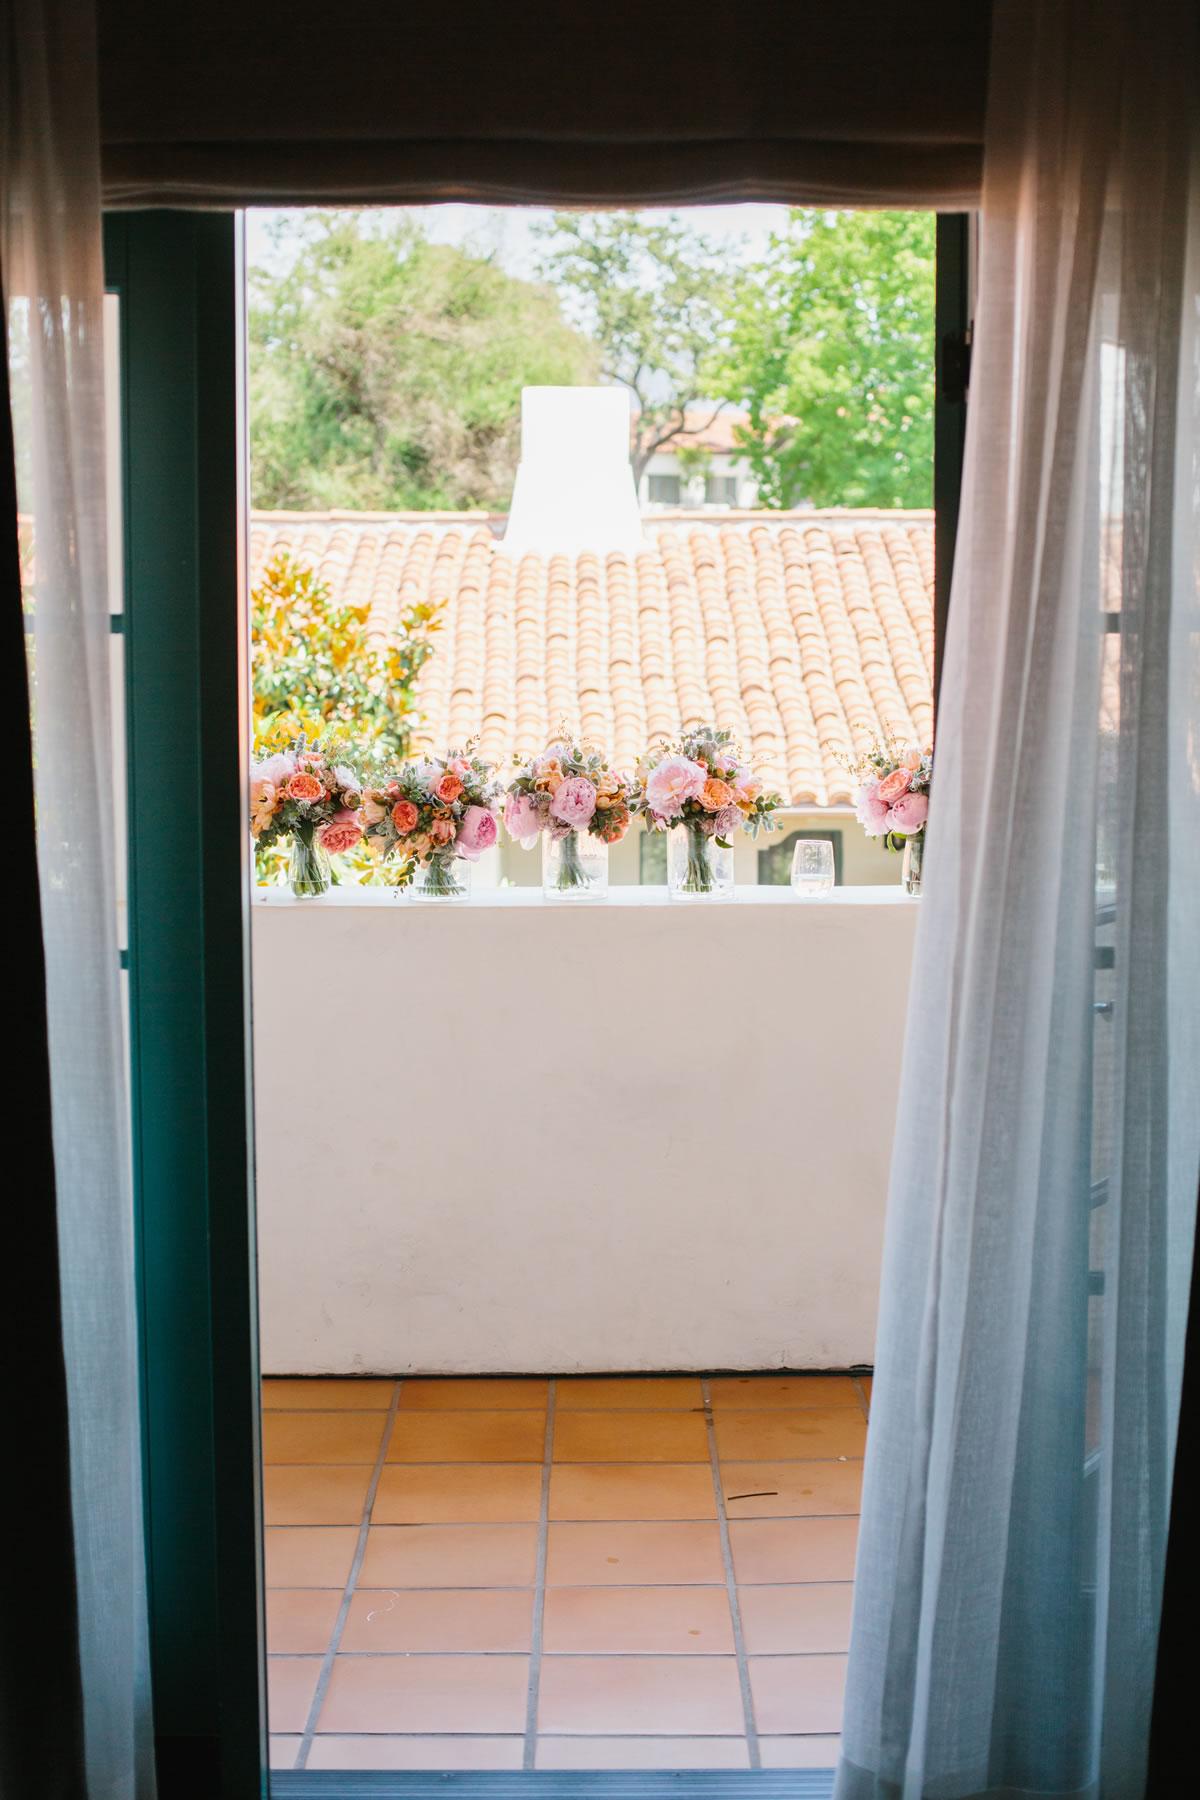 XOXO-BRIDE-Marianne-Wilson-Photography-JD-Details-005-3351714947-O